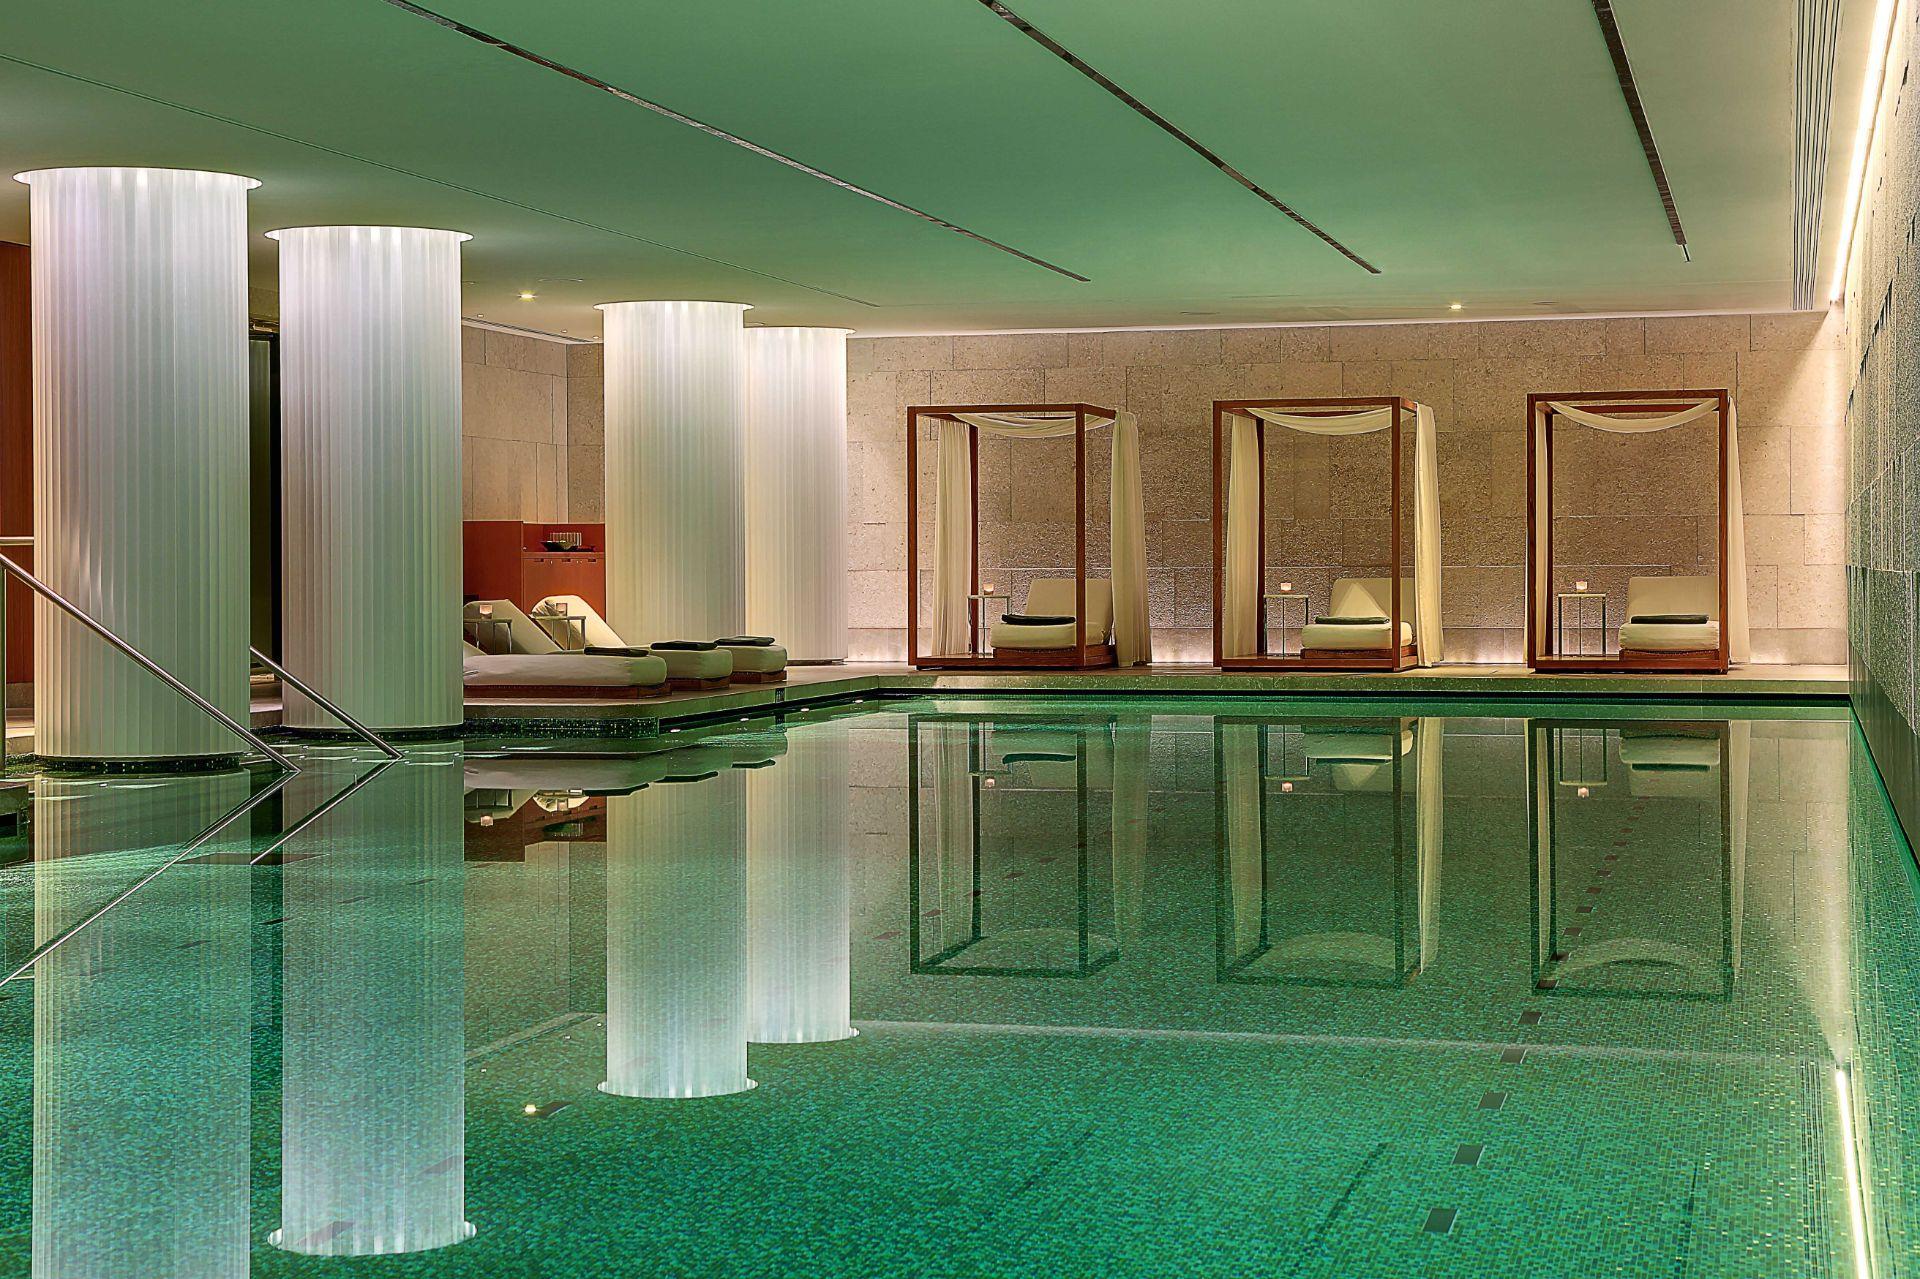 bulgari-spa-pool-lounge-london